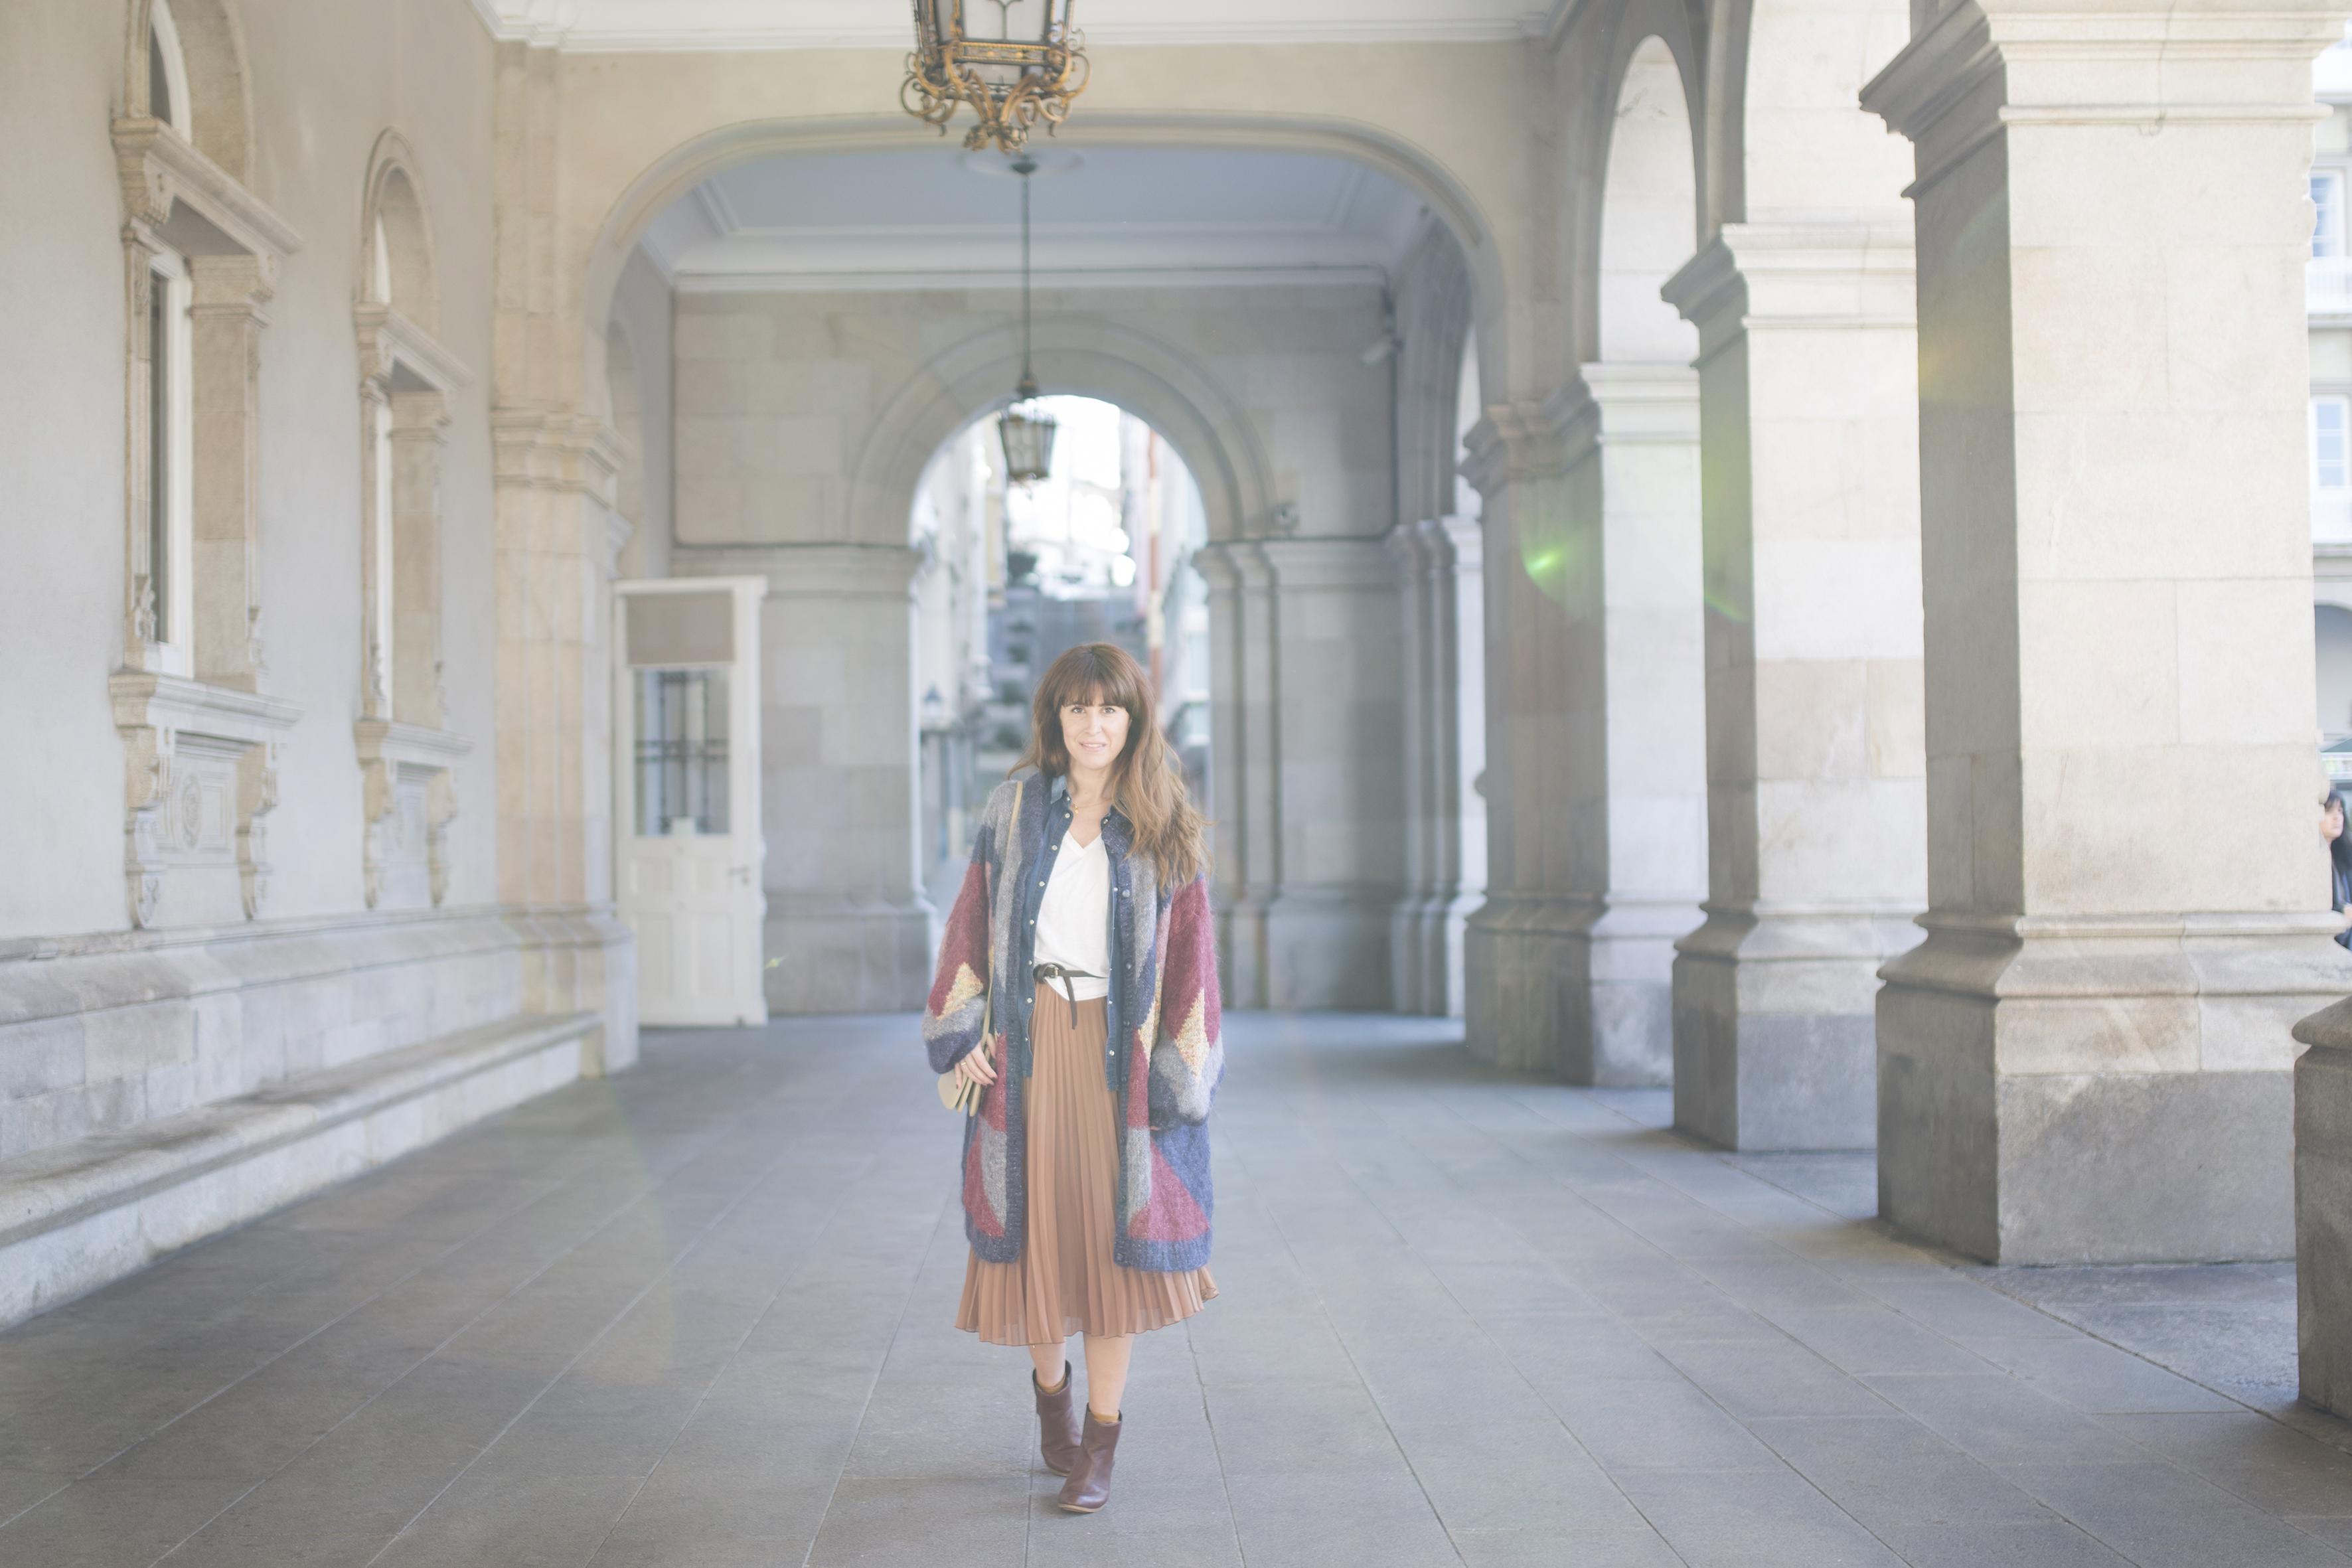 streetstyle-fashion-style-descalzaporelparque-zarapeople-zara-skir-cèline-coruña-blogger